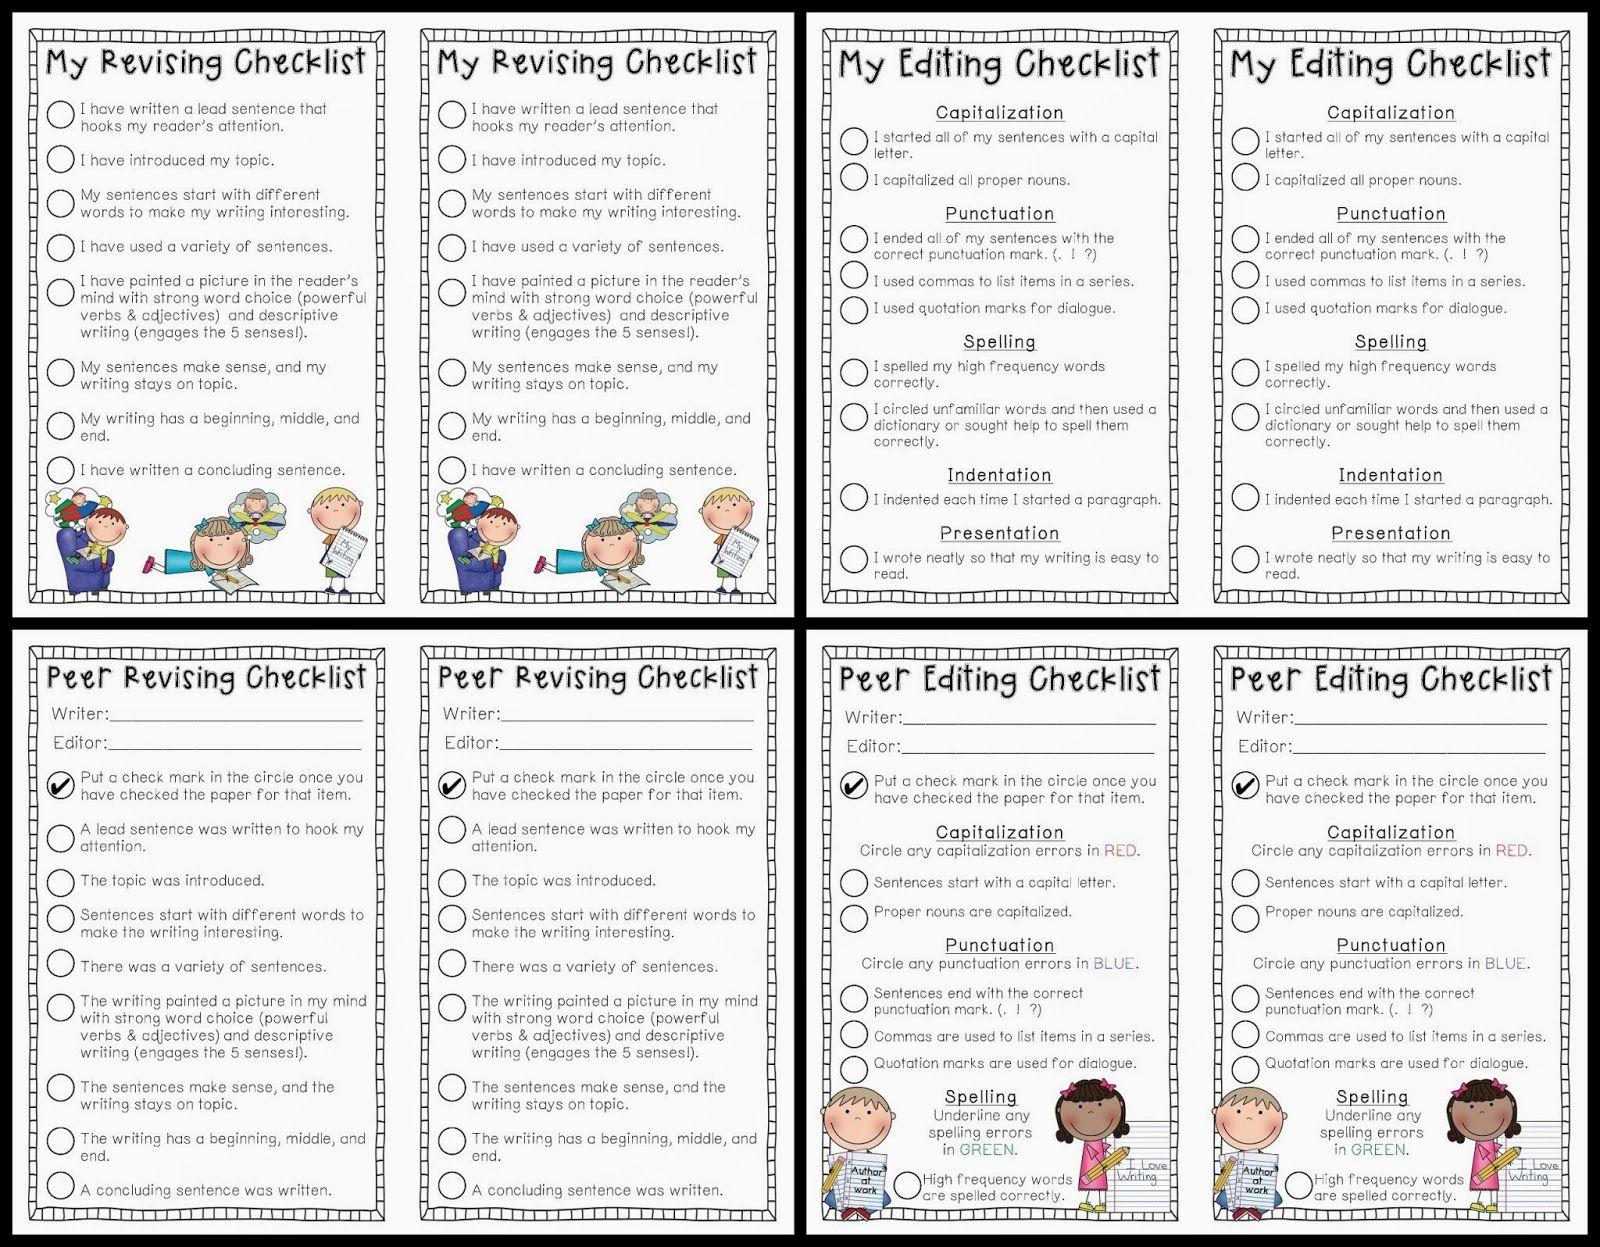 My Revising Amp Editing Checklists Peer Revising Amp Editing Checklists